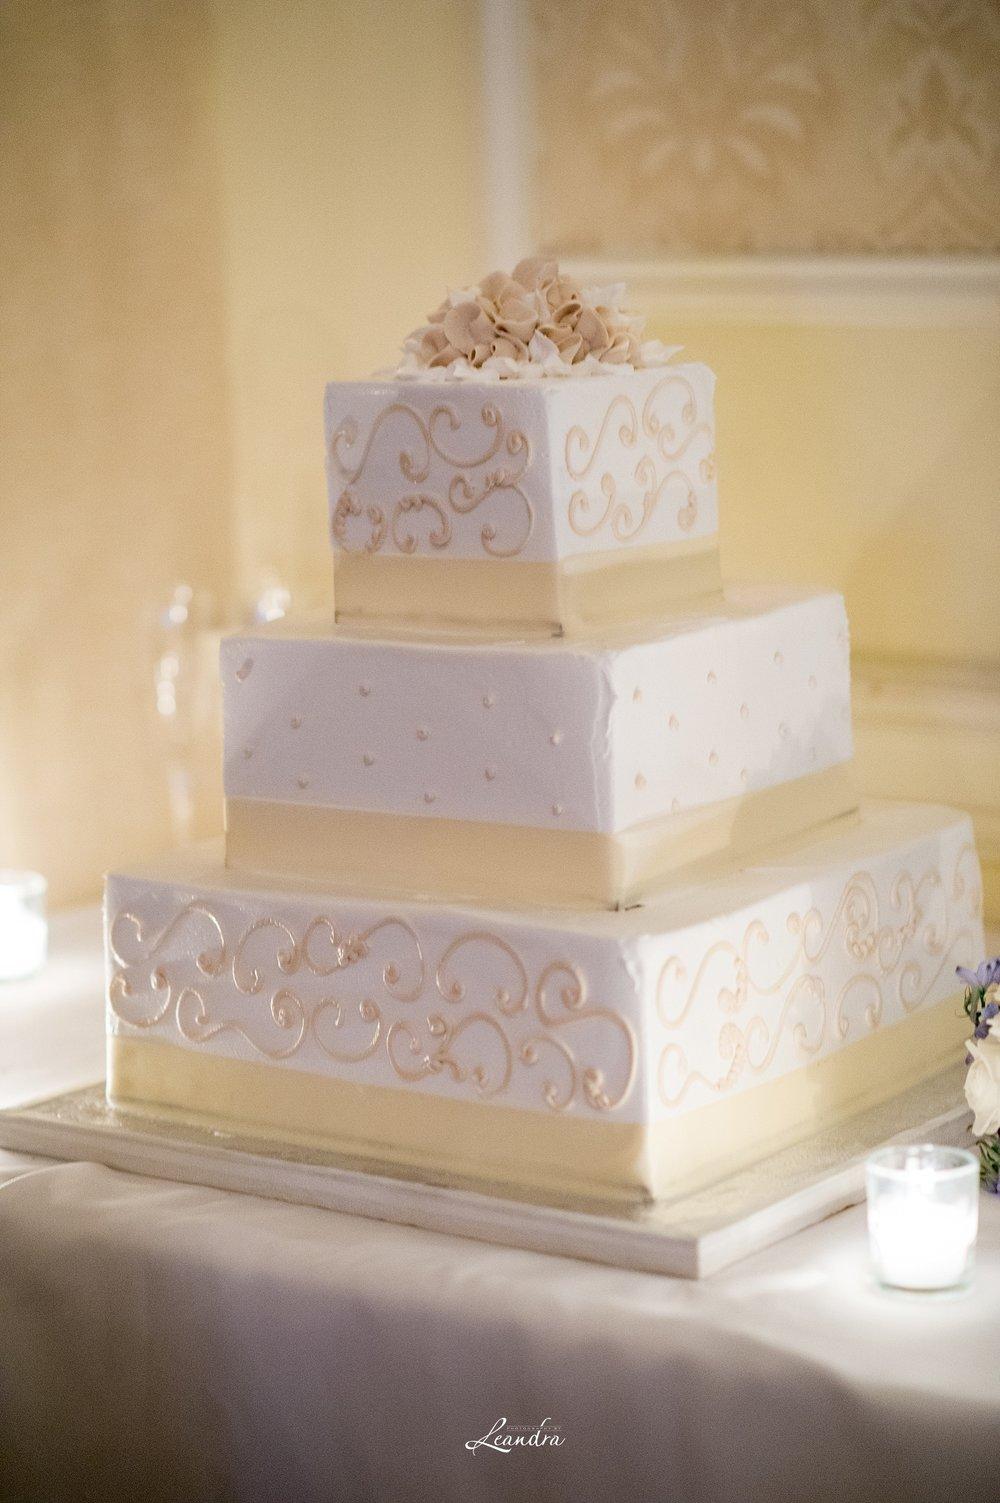 AlittleCake.WeddingCake.jpg